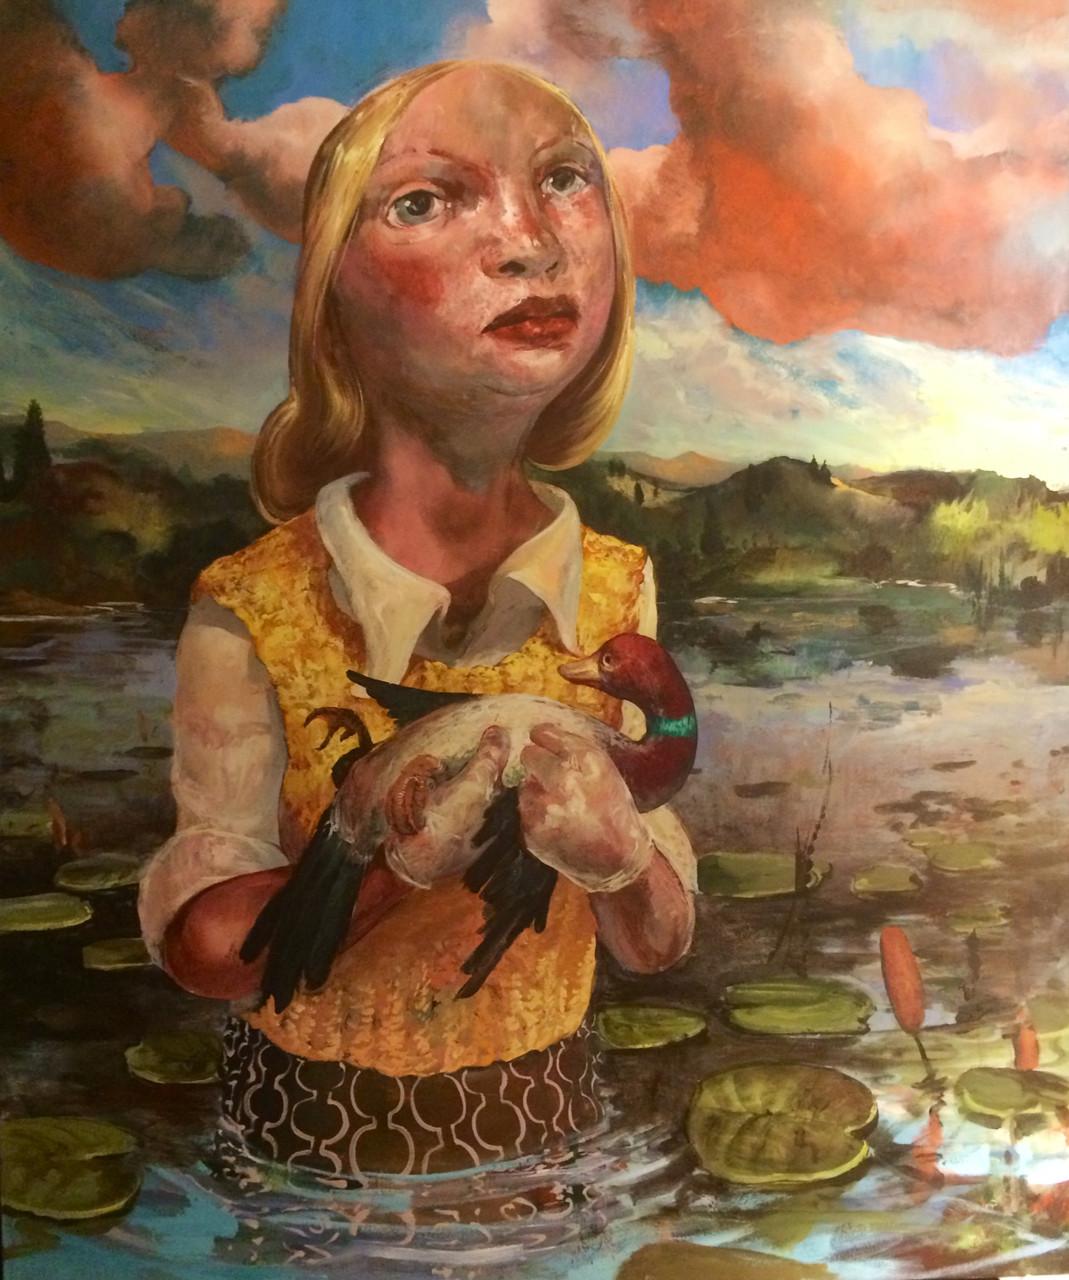 Big Danger , 2015 Acrylic on Canvas 72 x 60 in.